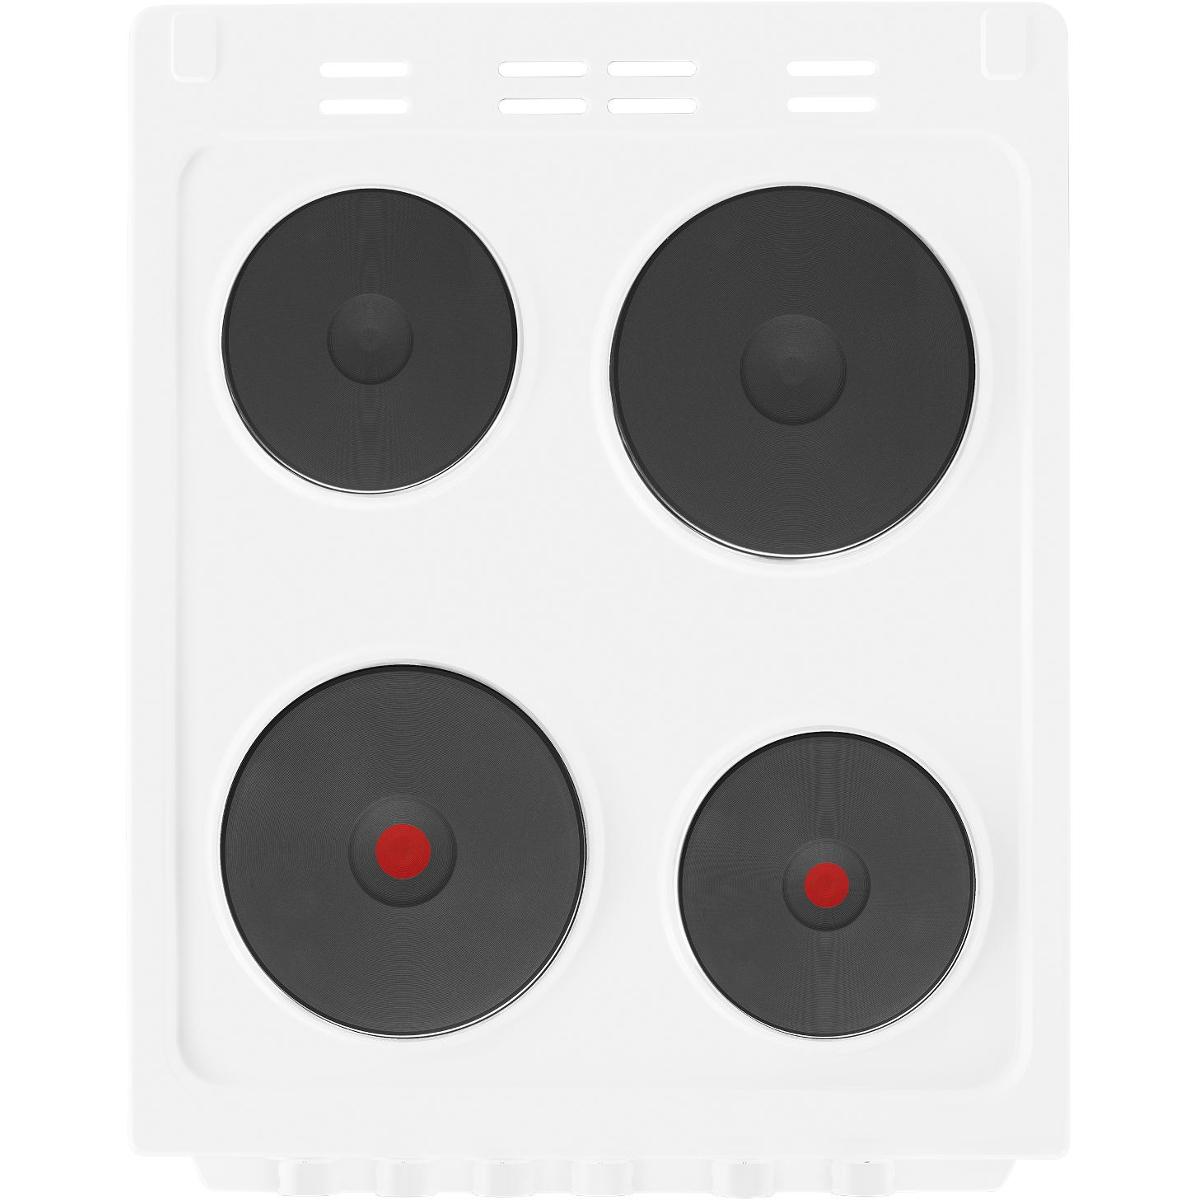 Beko Esp50w 50cm Single Oven Electric Cooker Discount